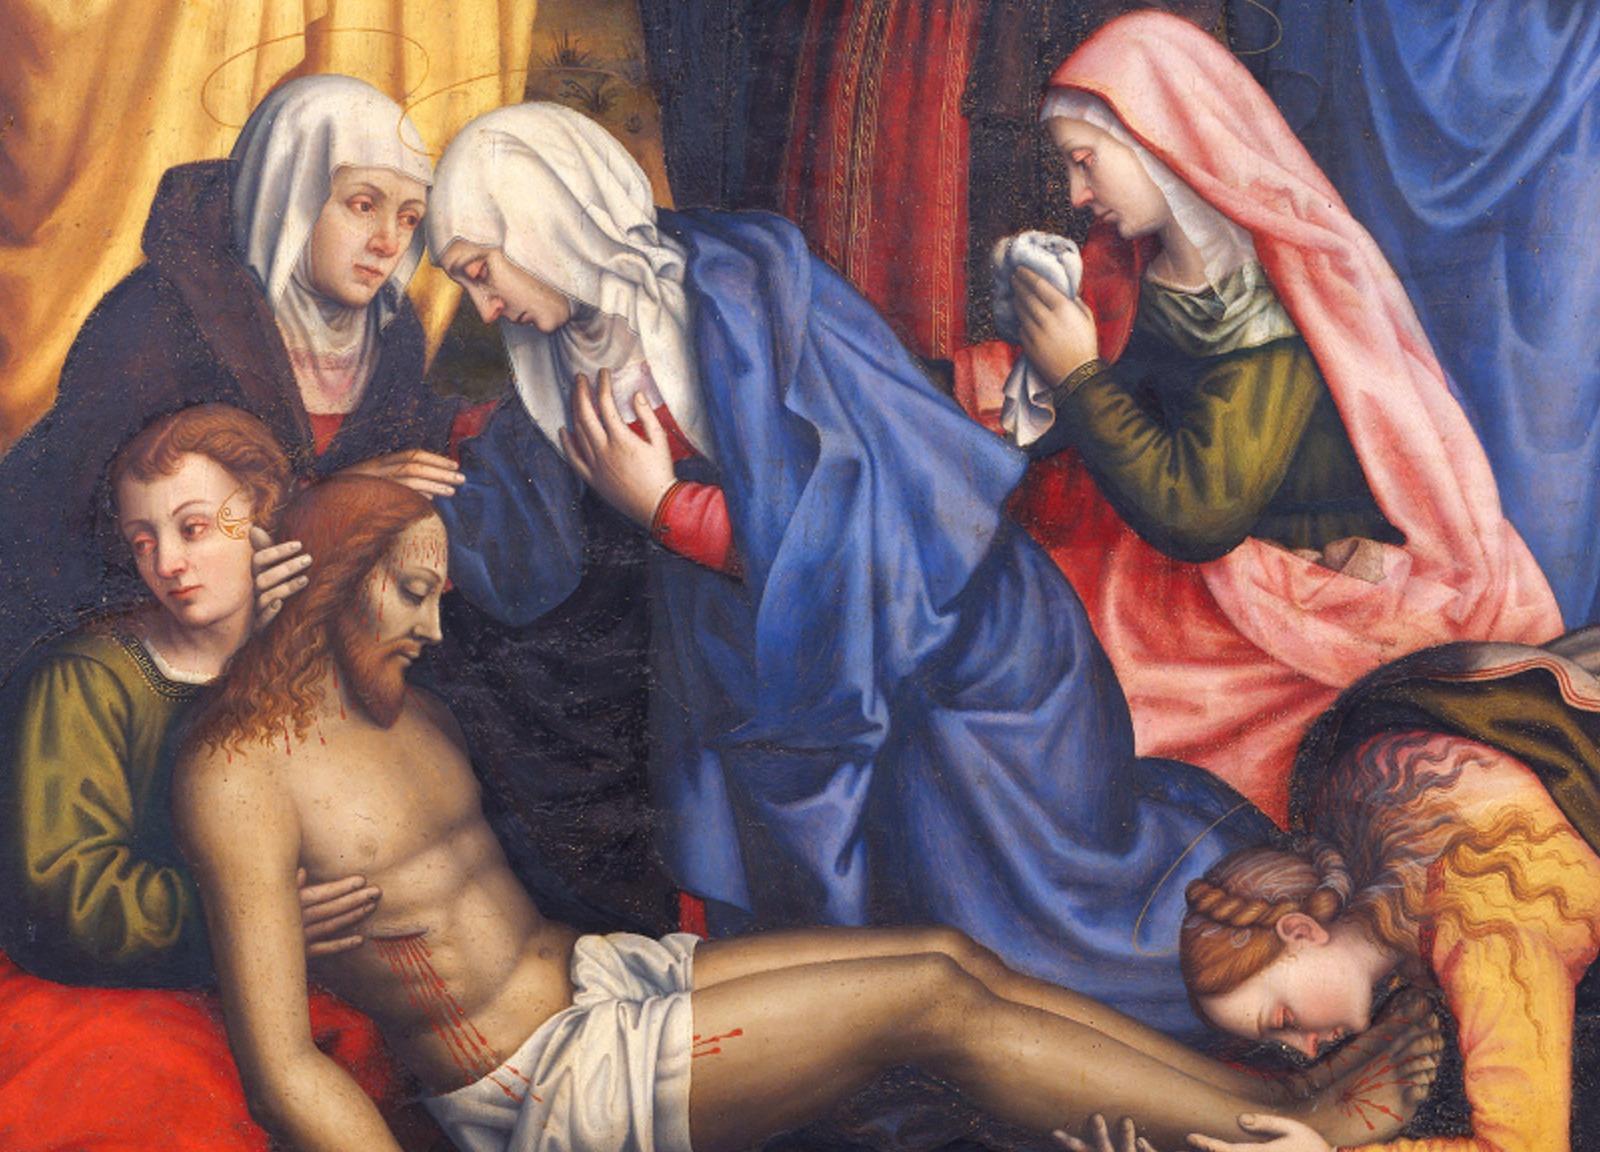 Plautilla-Nelli-Lamentation-with-Saints.jpg